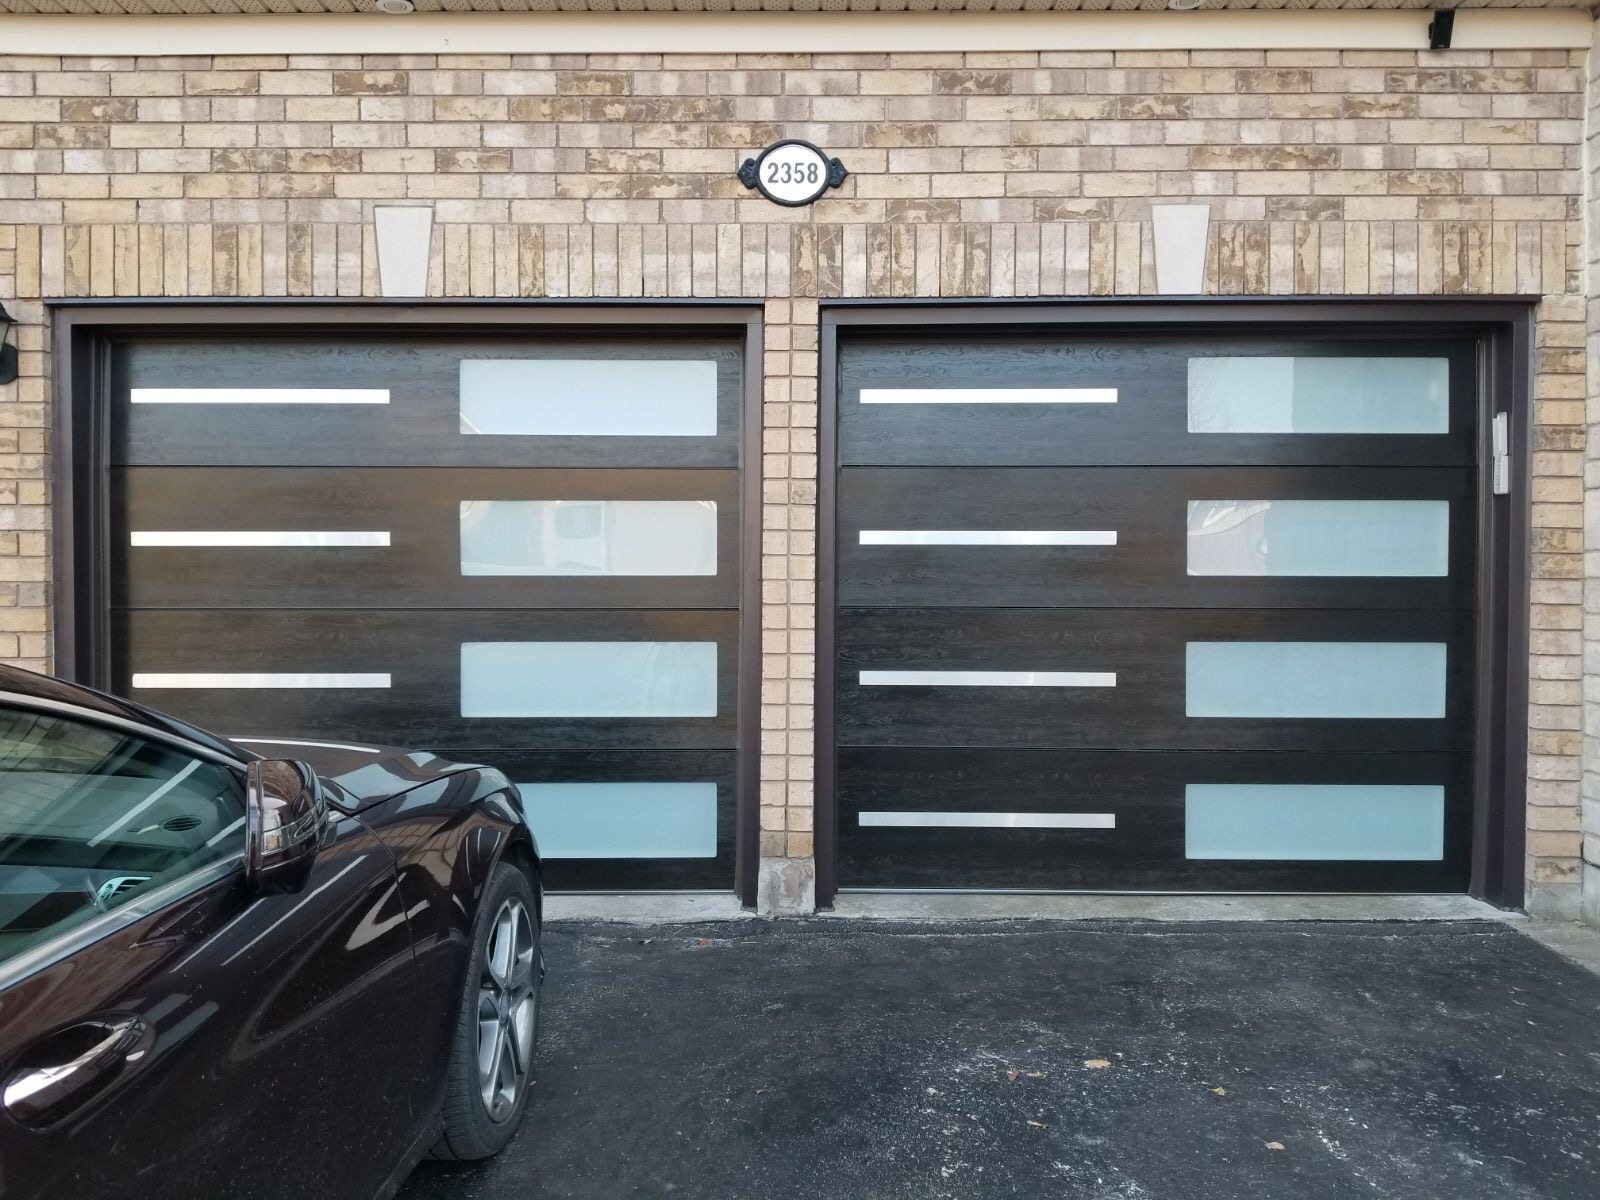 Modern Garage Doors |Stainless Steel | Glass Strip